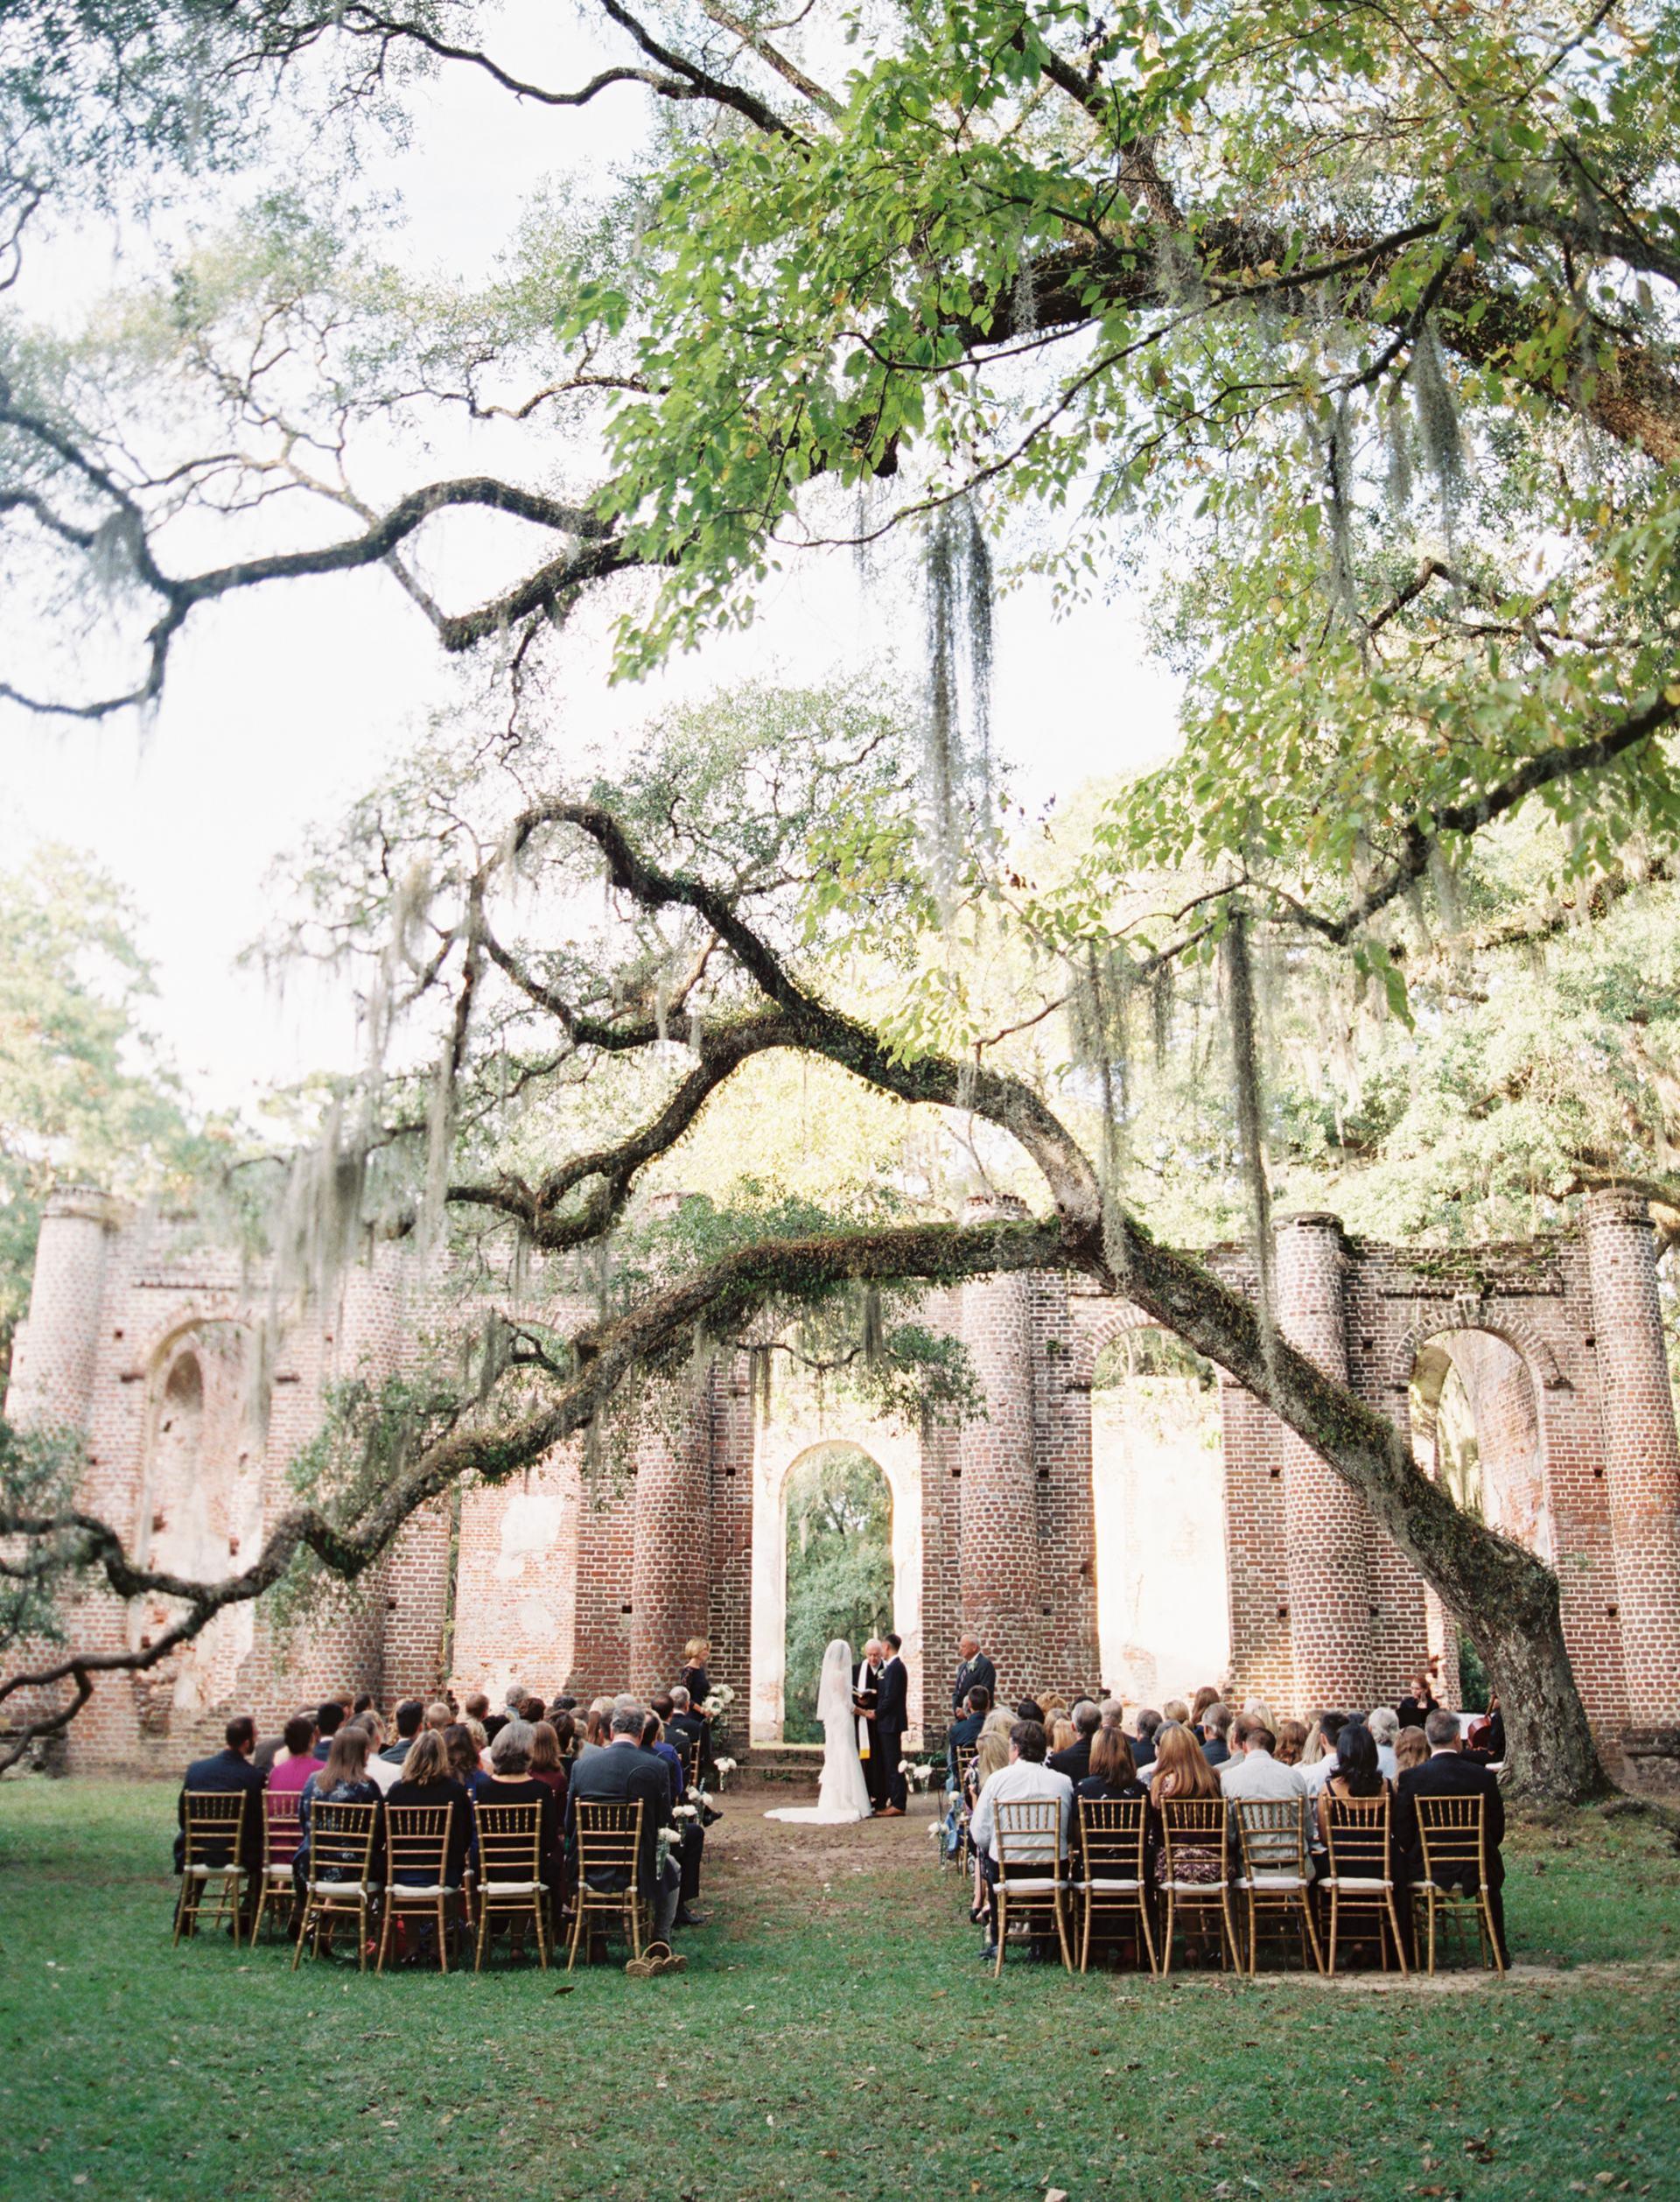 old sheldon church ruins oak trees wedding